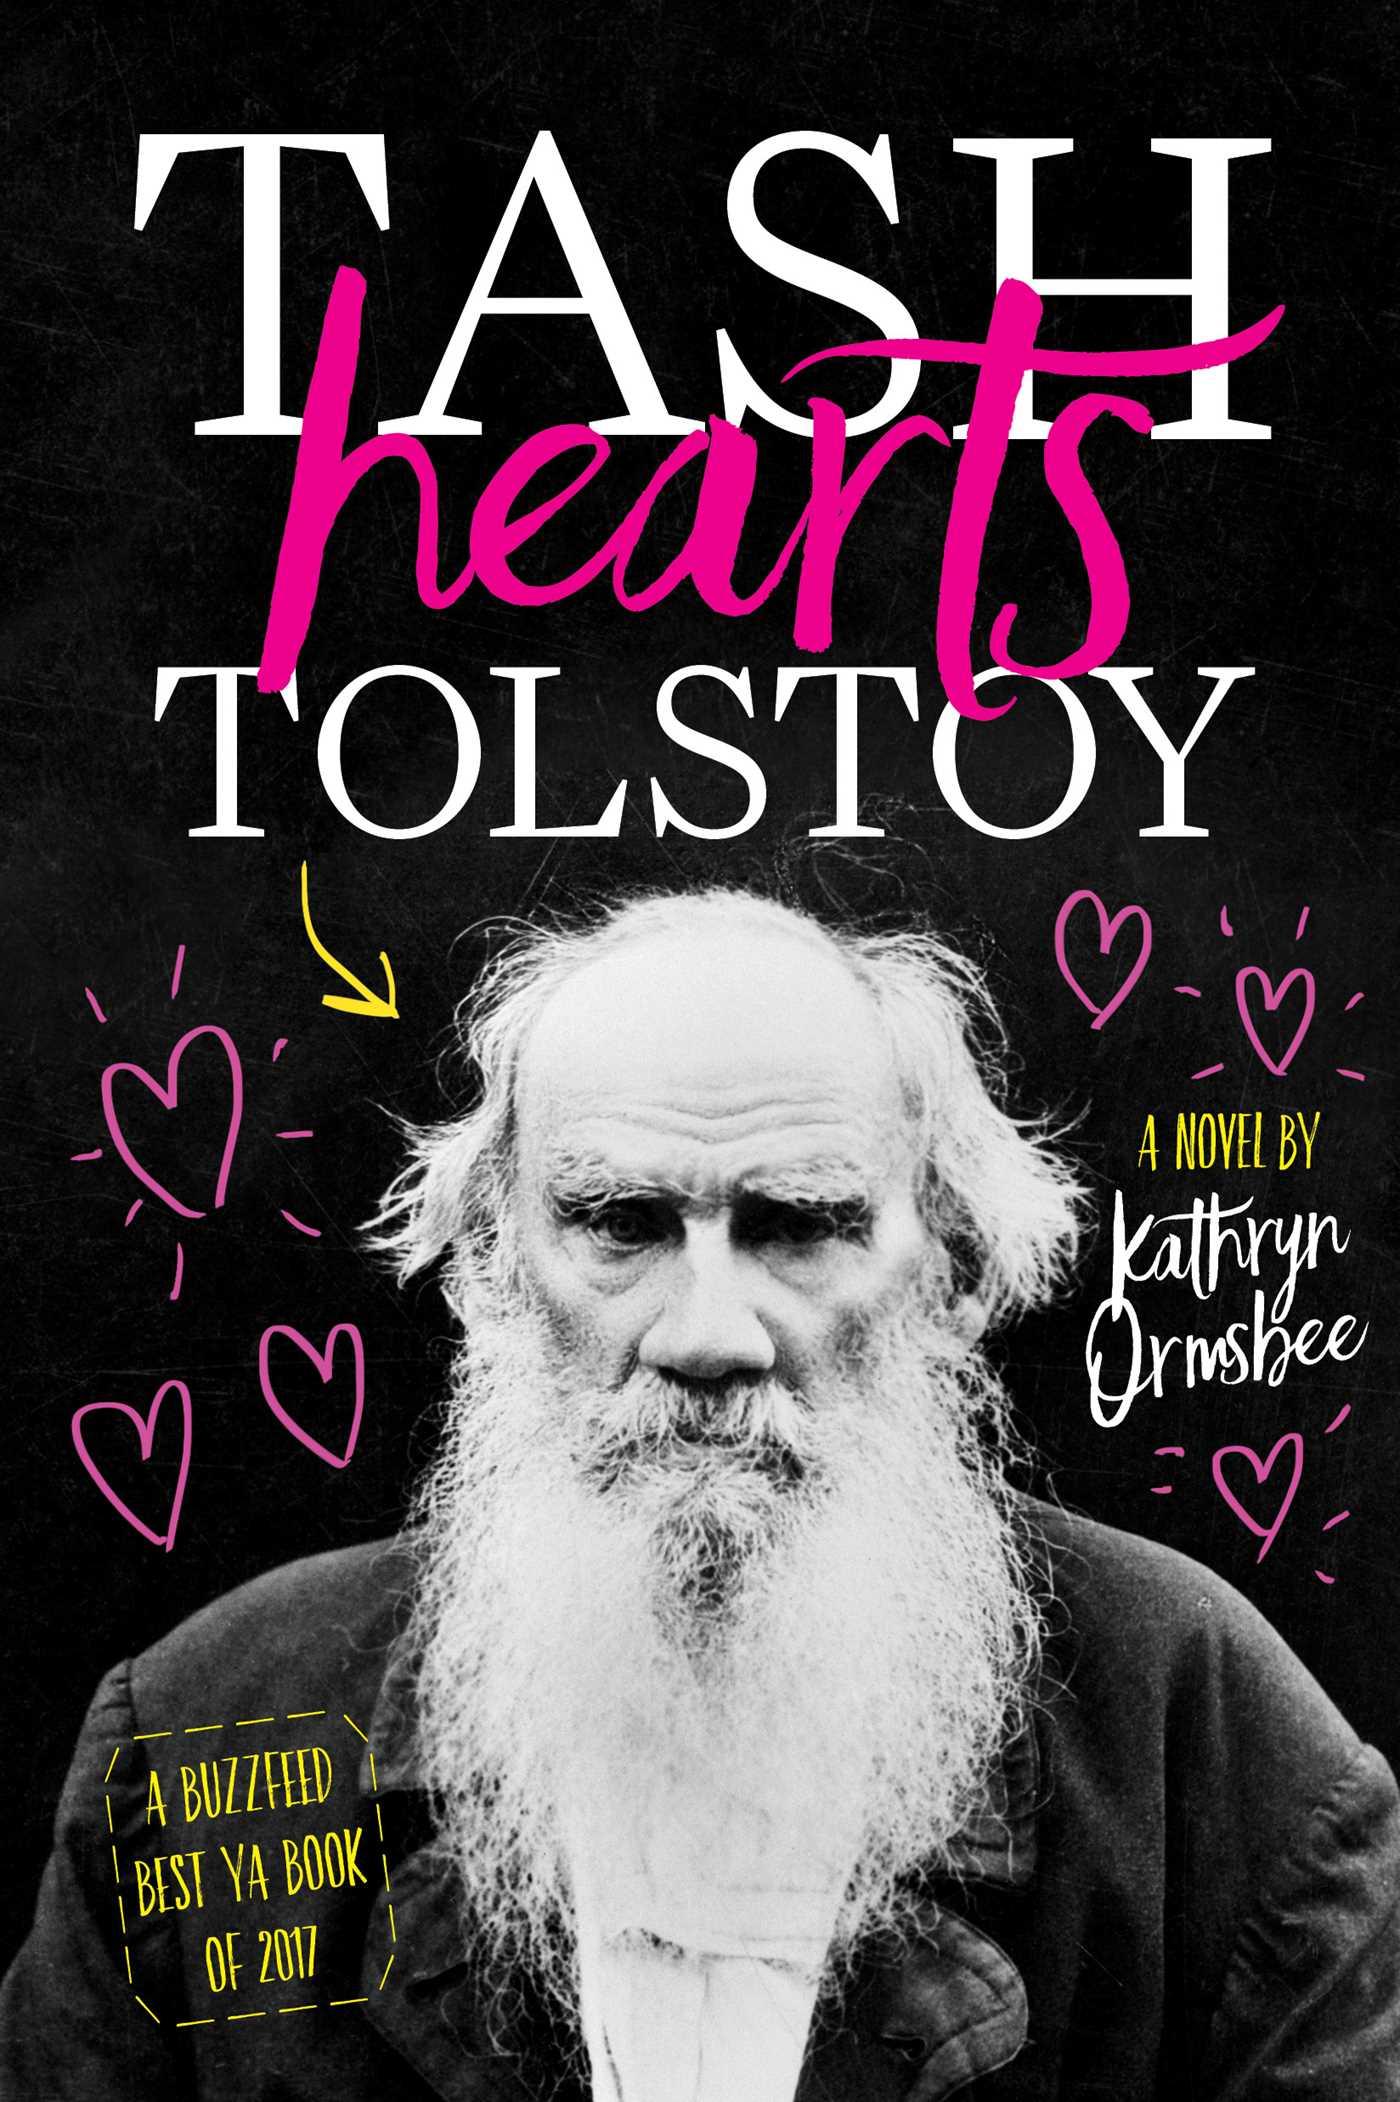 Tash hearts tolstoy 9781481489355 hr